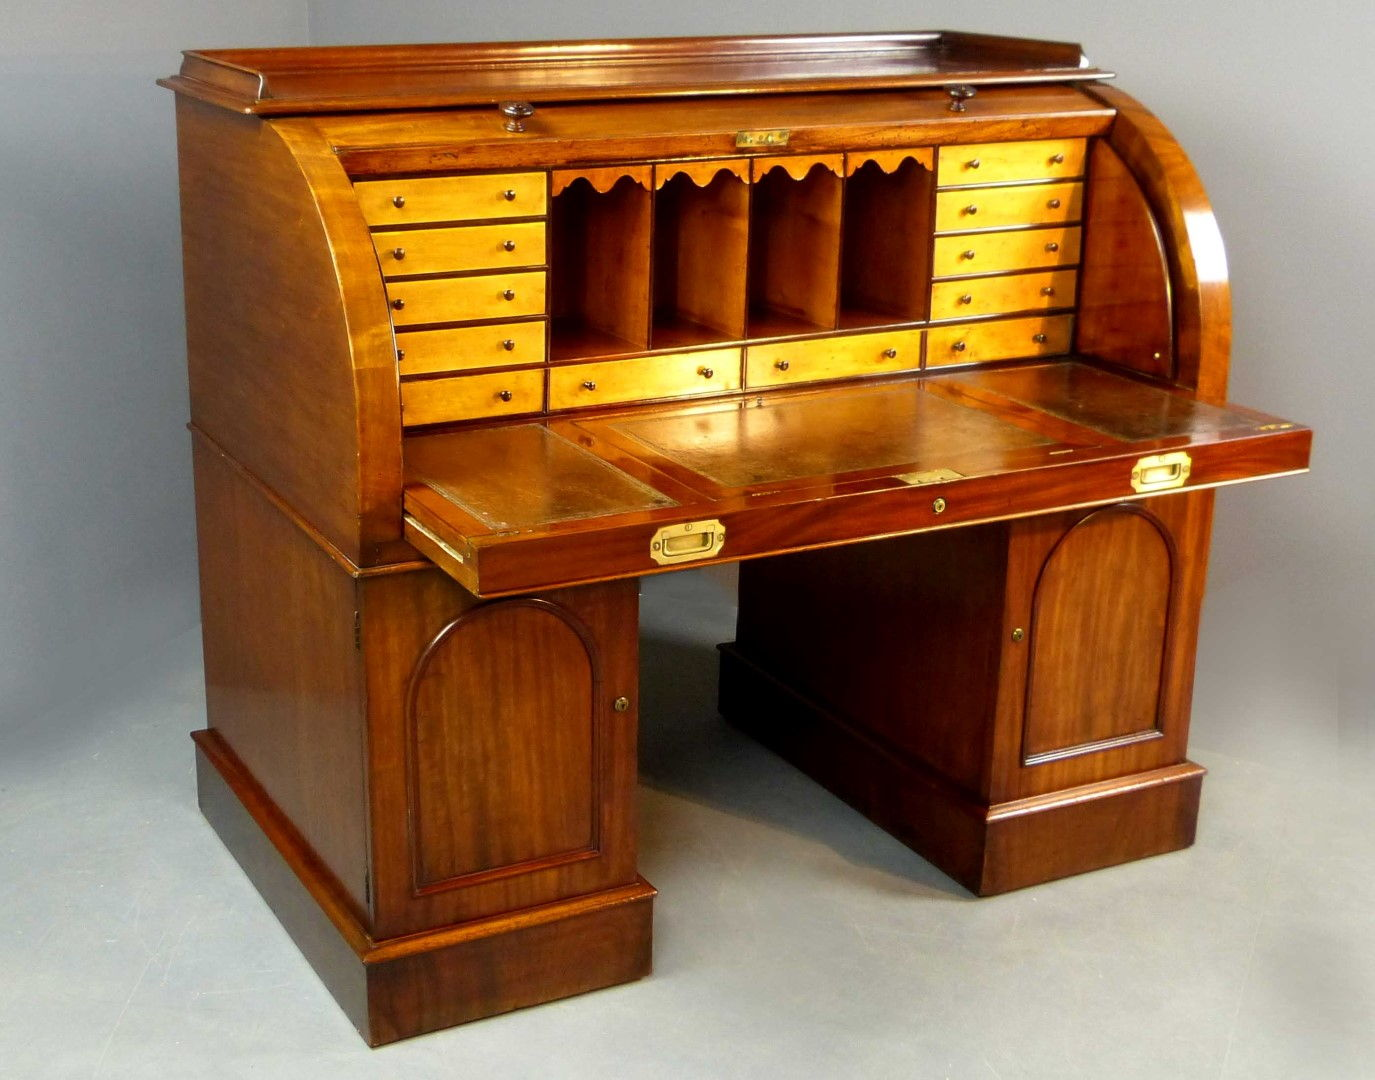 Antique Desk Cylinder Top x-Sir Stafford Cripps - Antique Furniture Antique Cupboards Antique Tables Antique